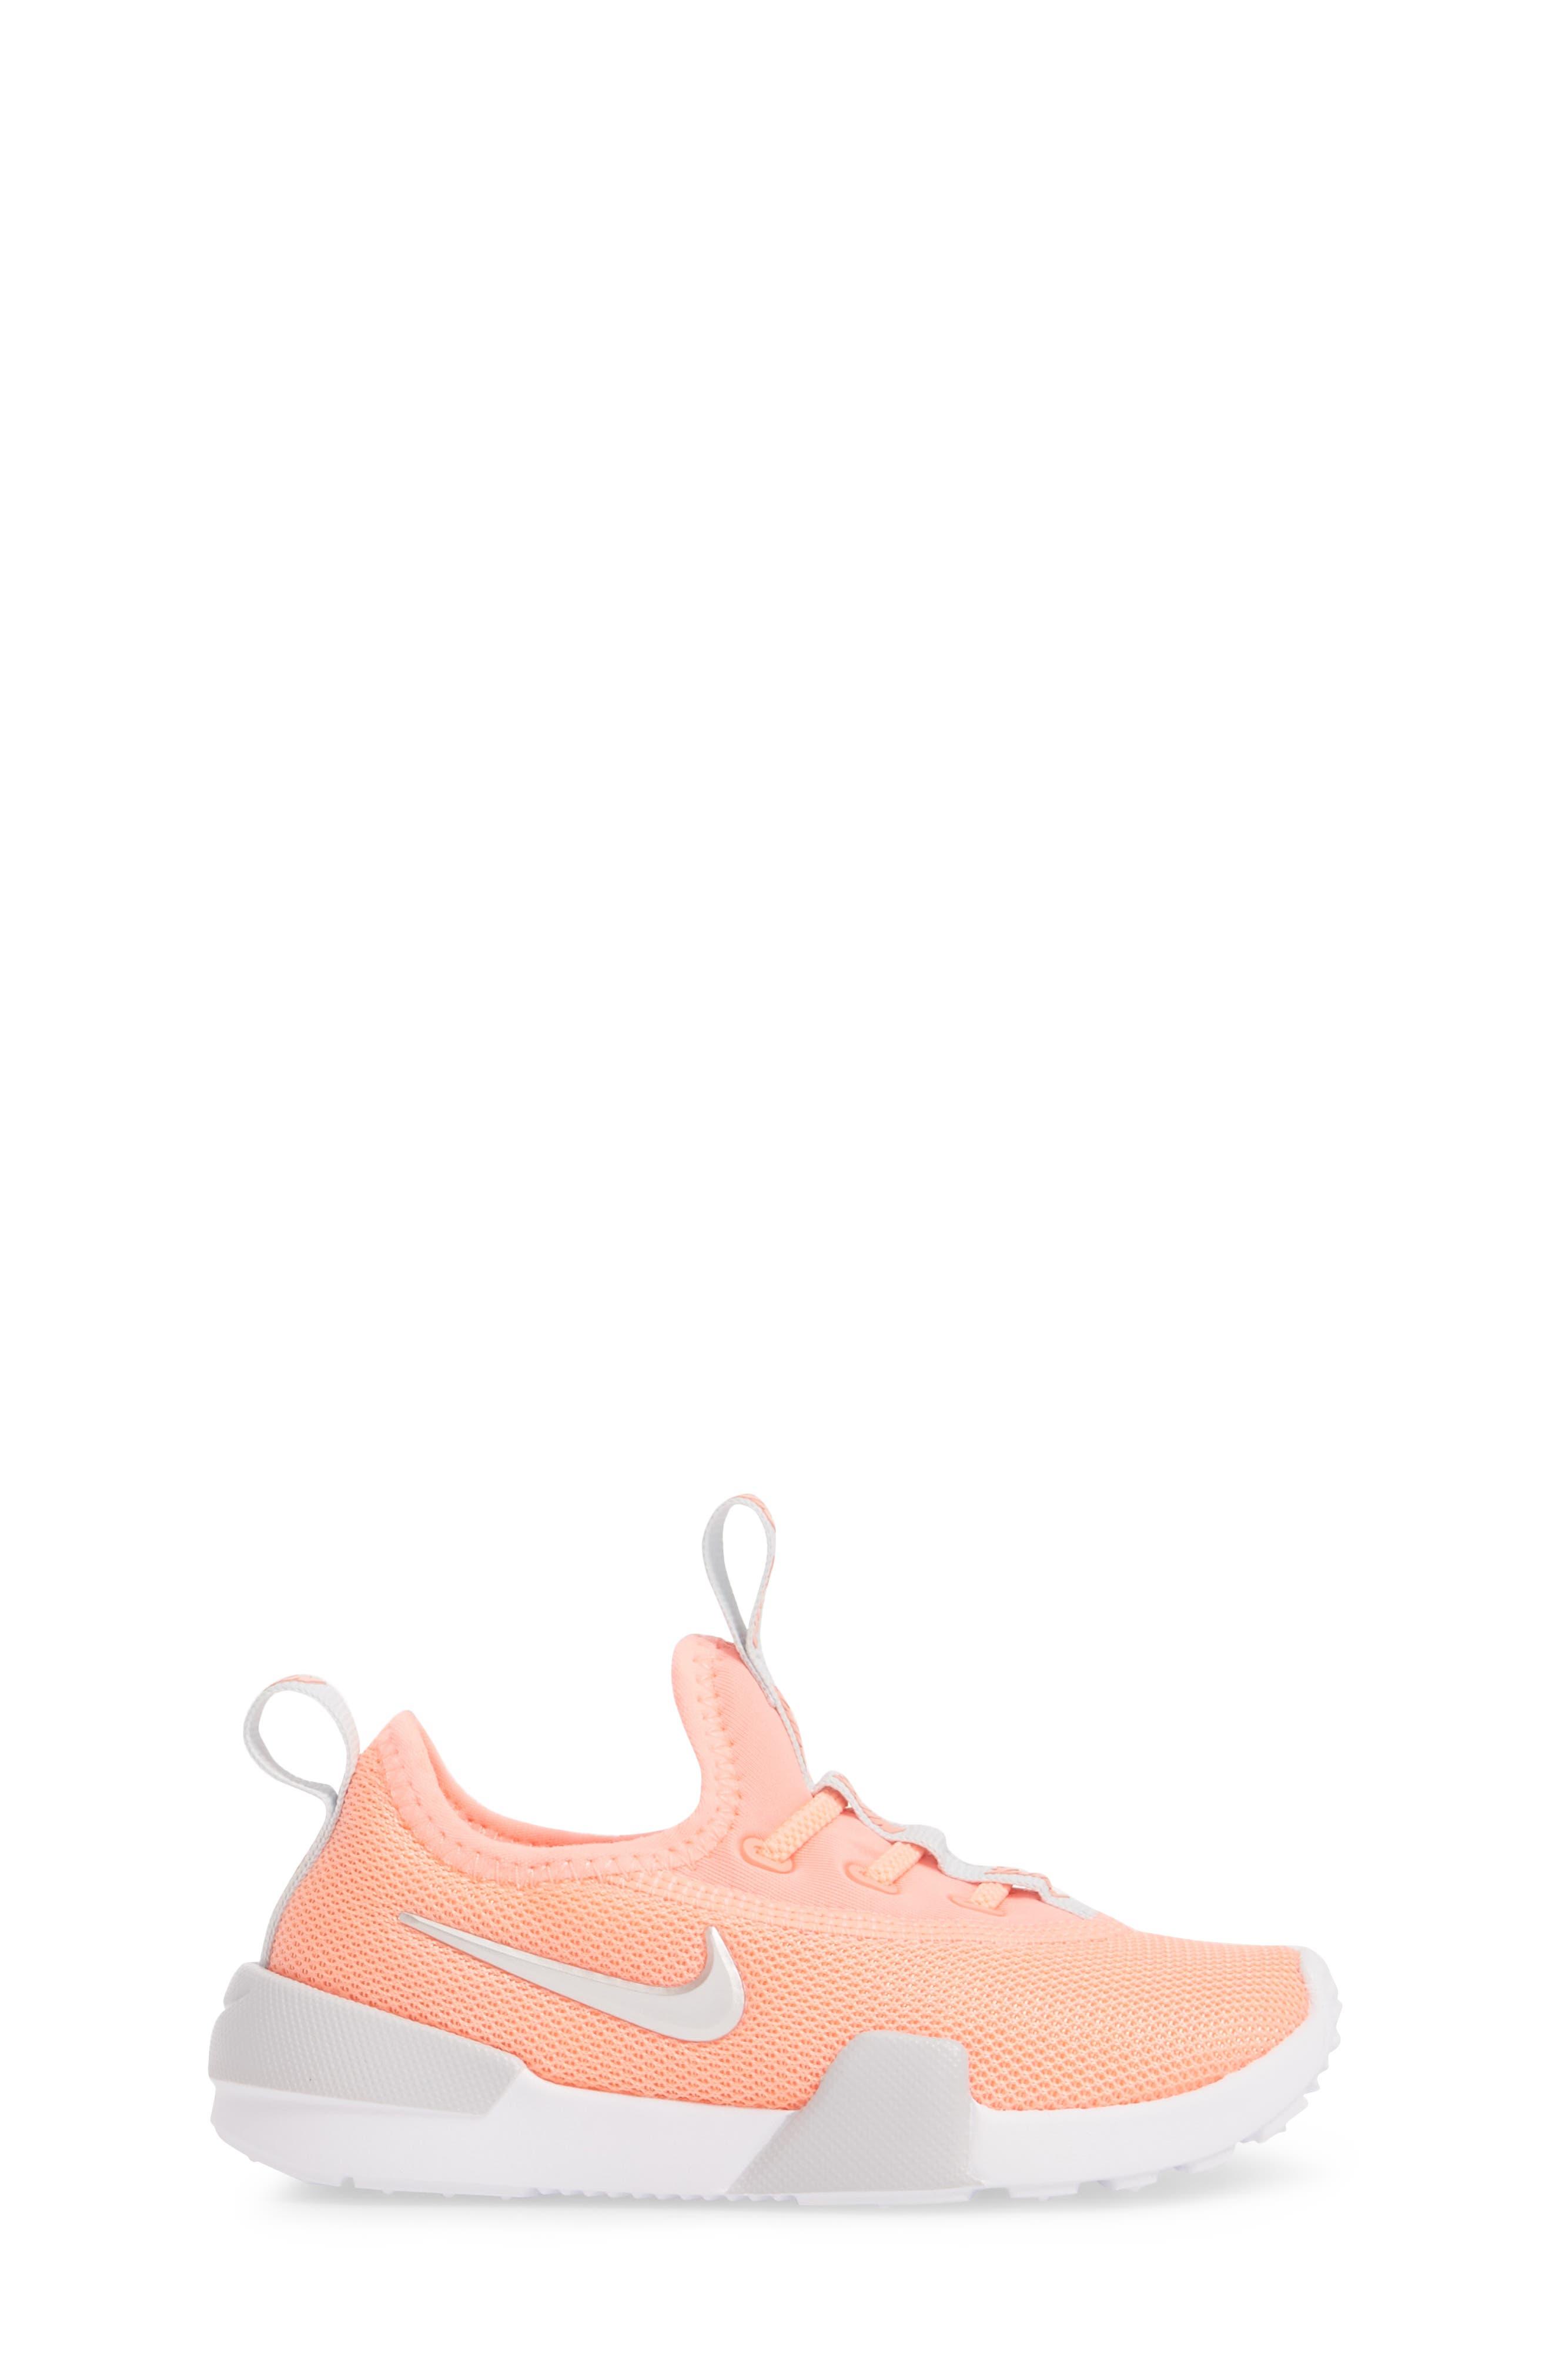 Ashin Modern Sock Knit Sneaker,                             Alternate thumbnail 3, color,                             Atomic Pink/ Metallic Silver